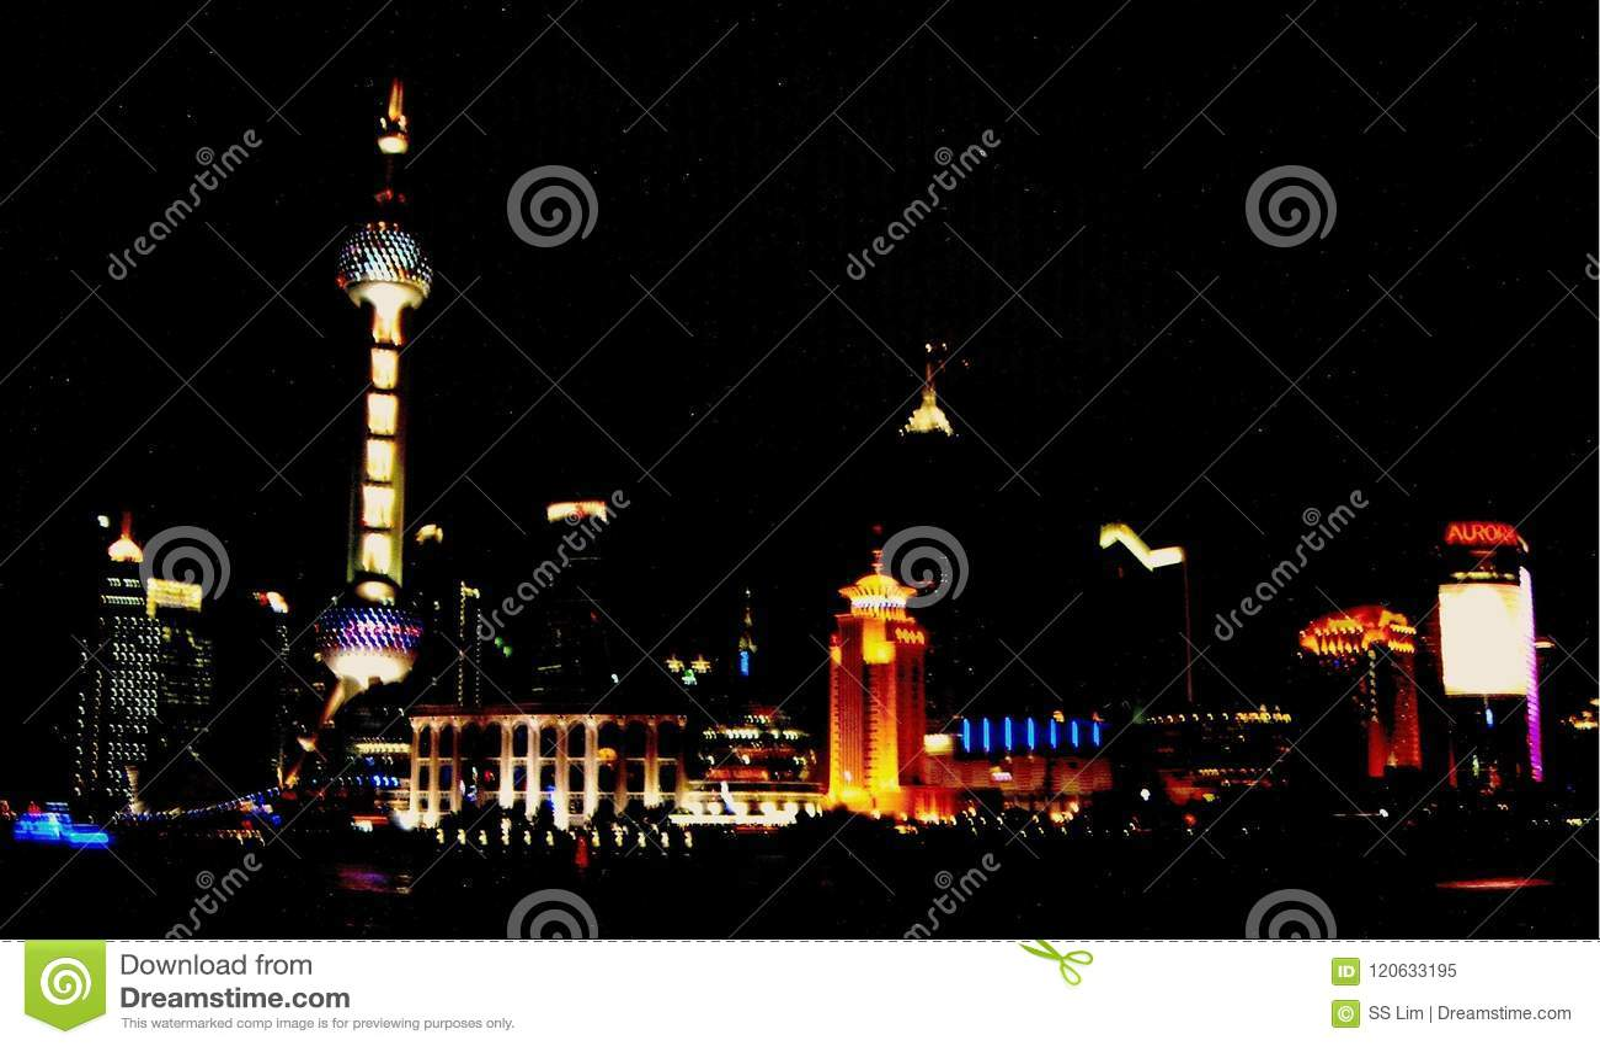 Shanghai Cosmopolitan Area at Night